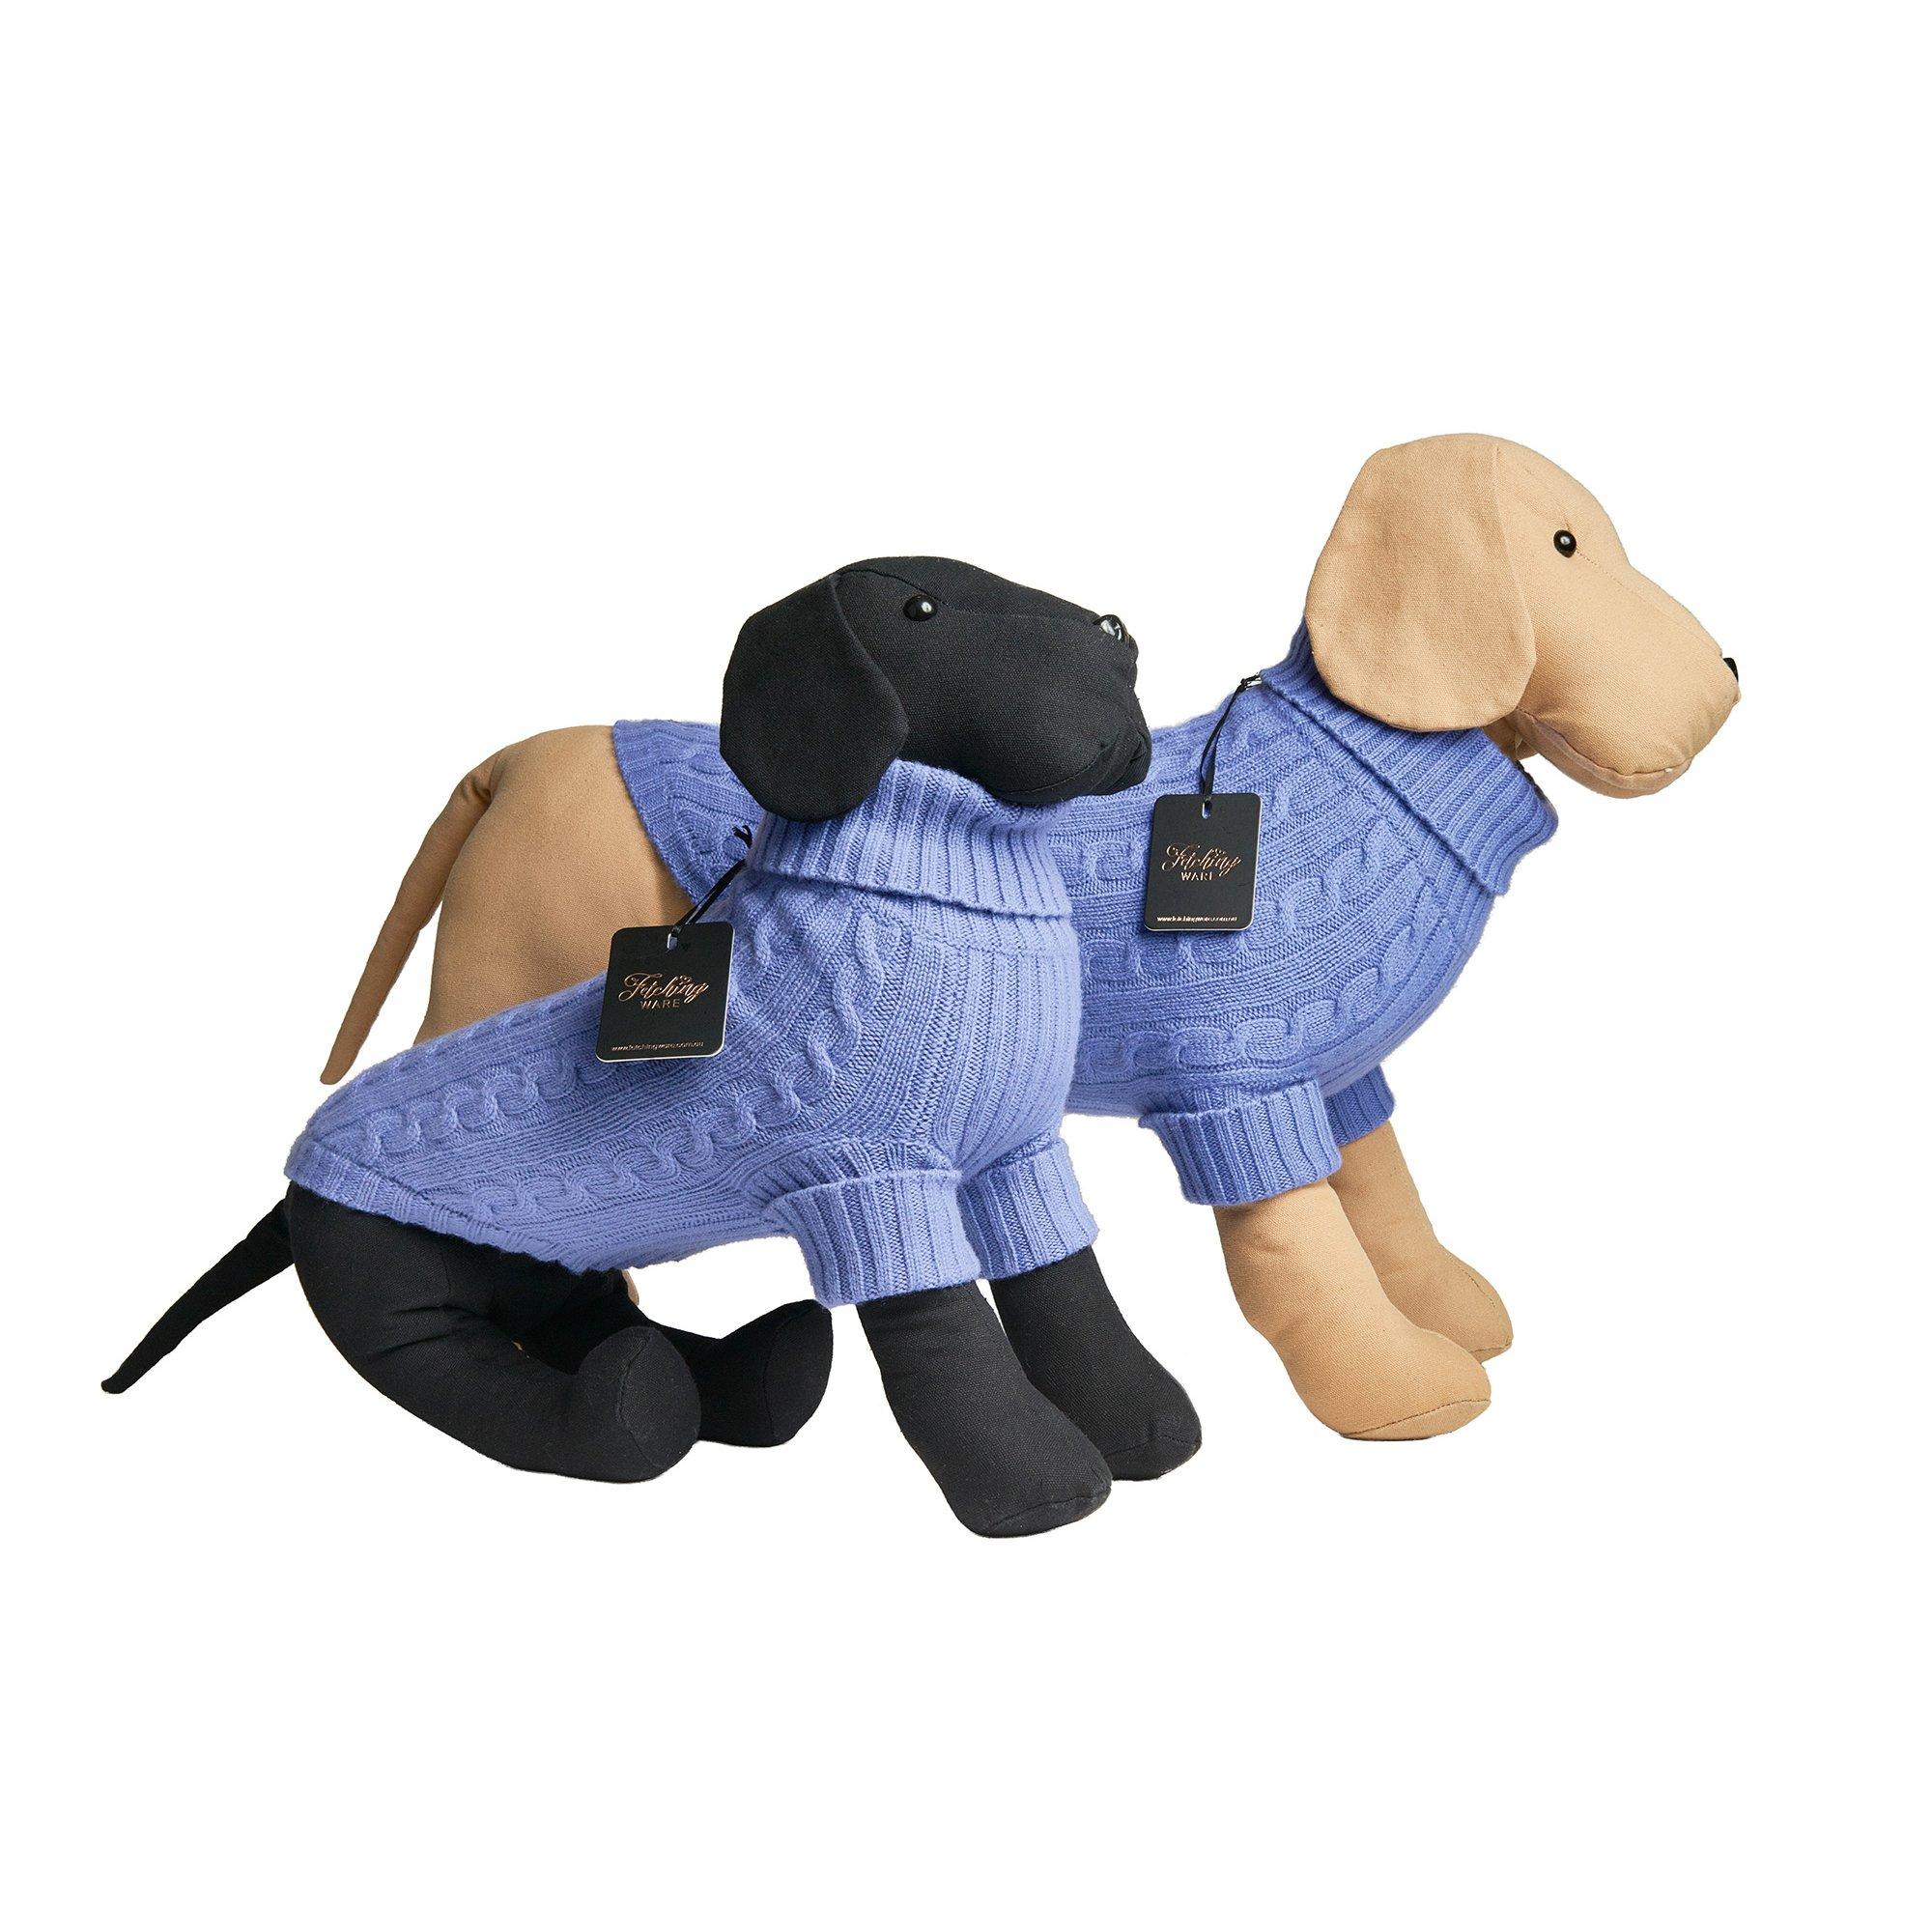 100% Blue Merino Wool Dog Sweater / Turtleneck (Small)